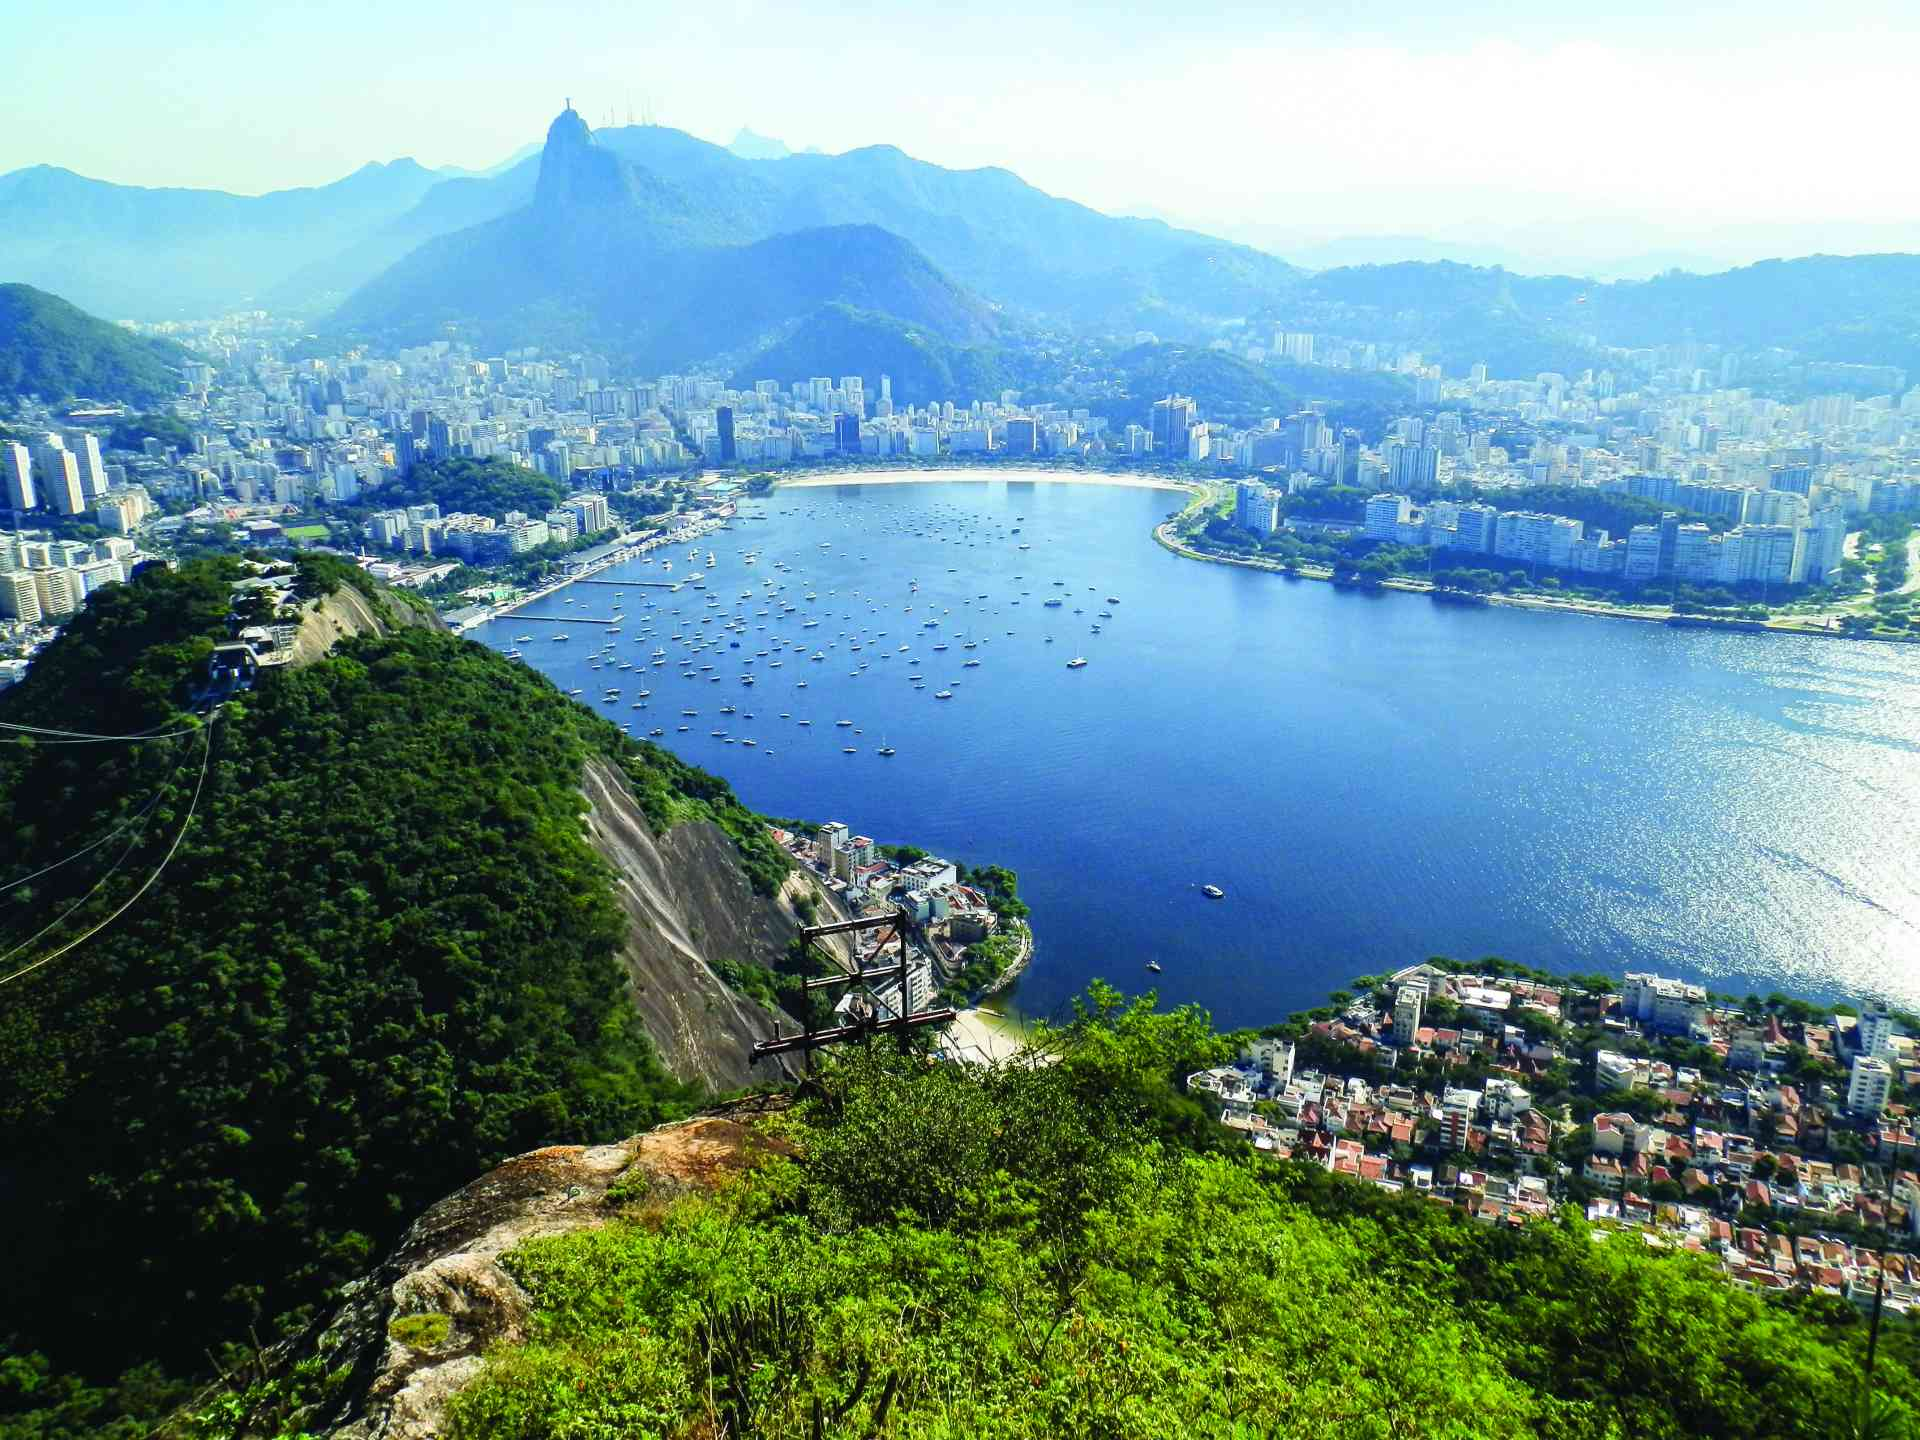 Rio de Janeiro, Brazil by Annelies Visser